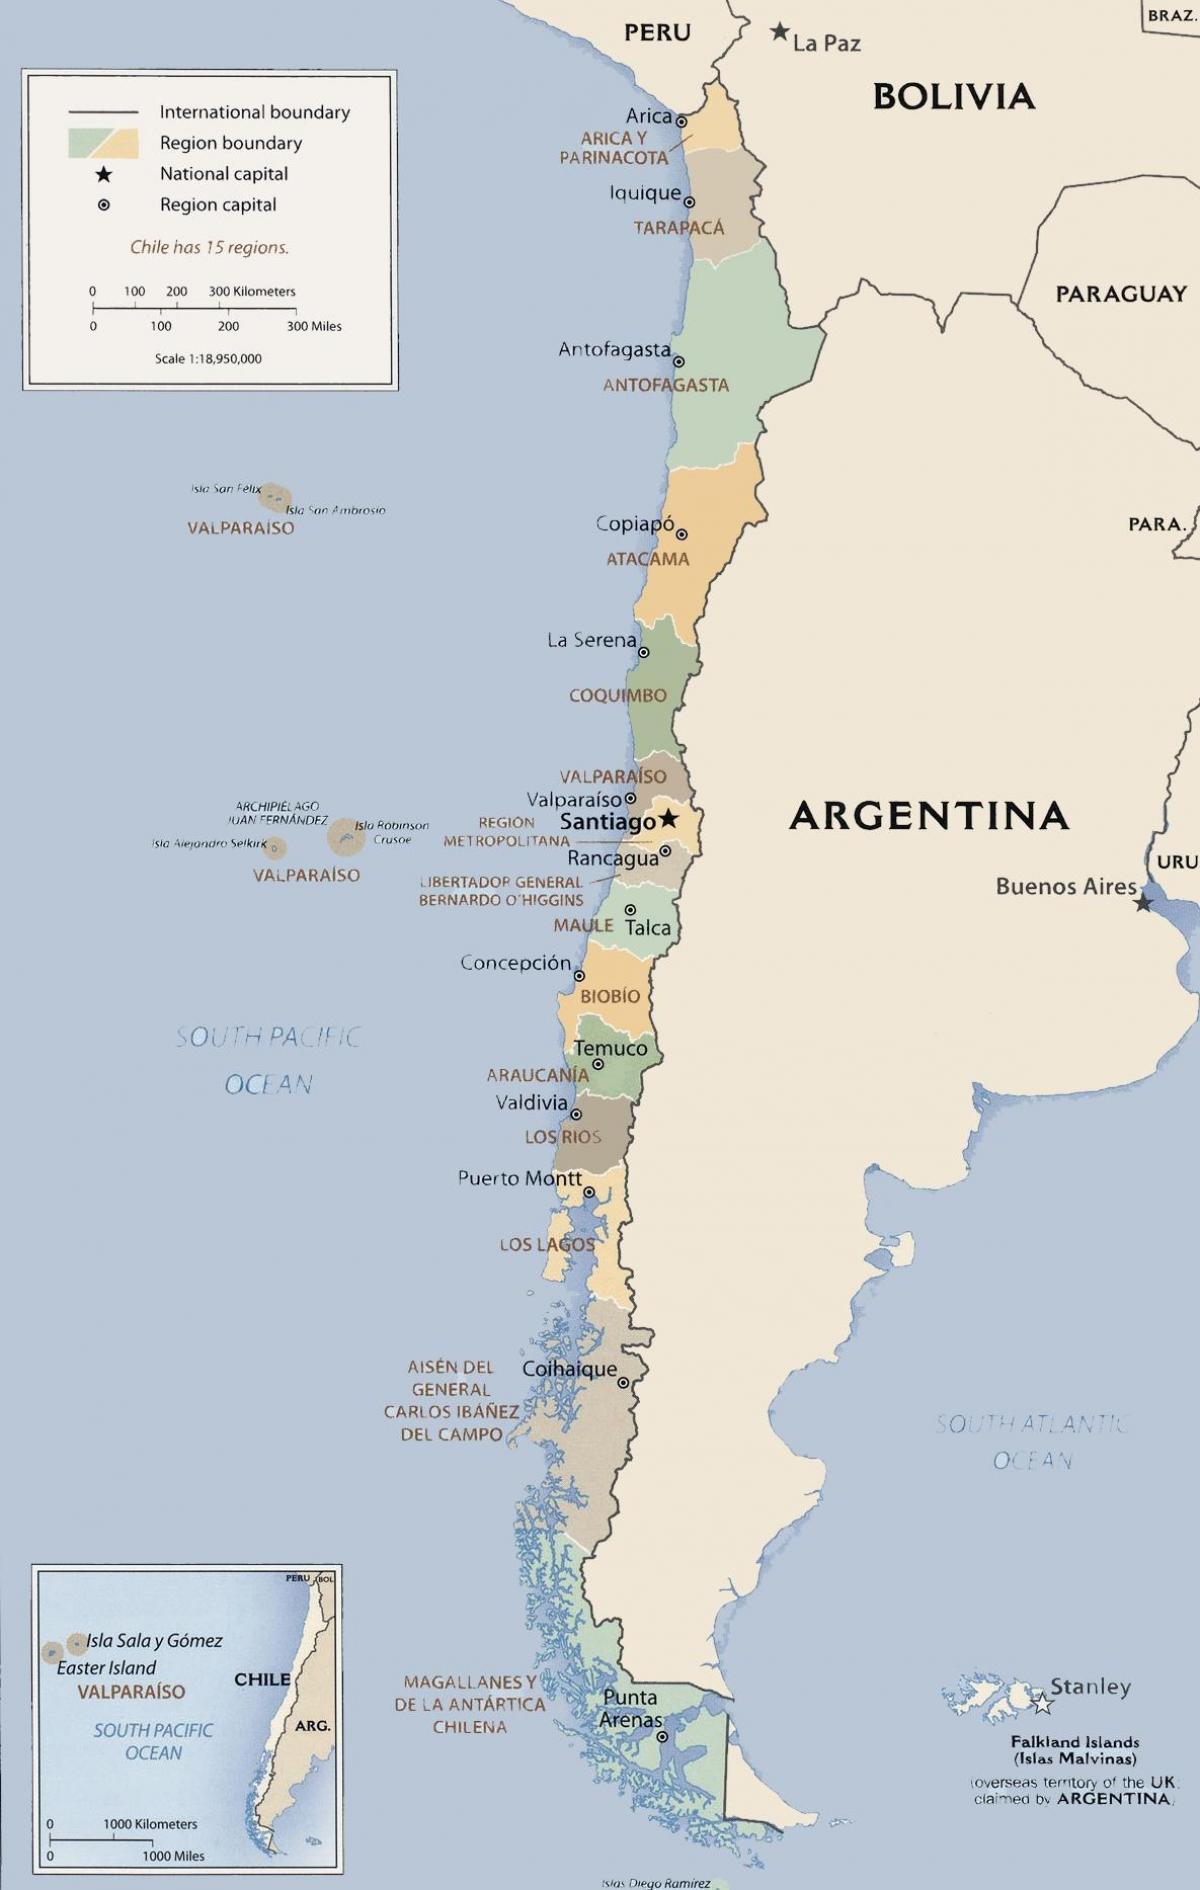 Mapa Politico De Chile.Mapa Politico De Chile Mapa Politico De Chile America Do